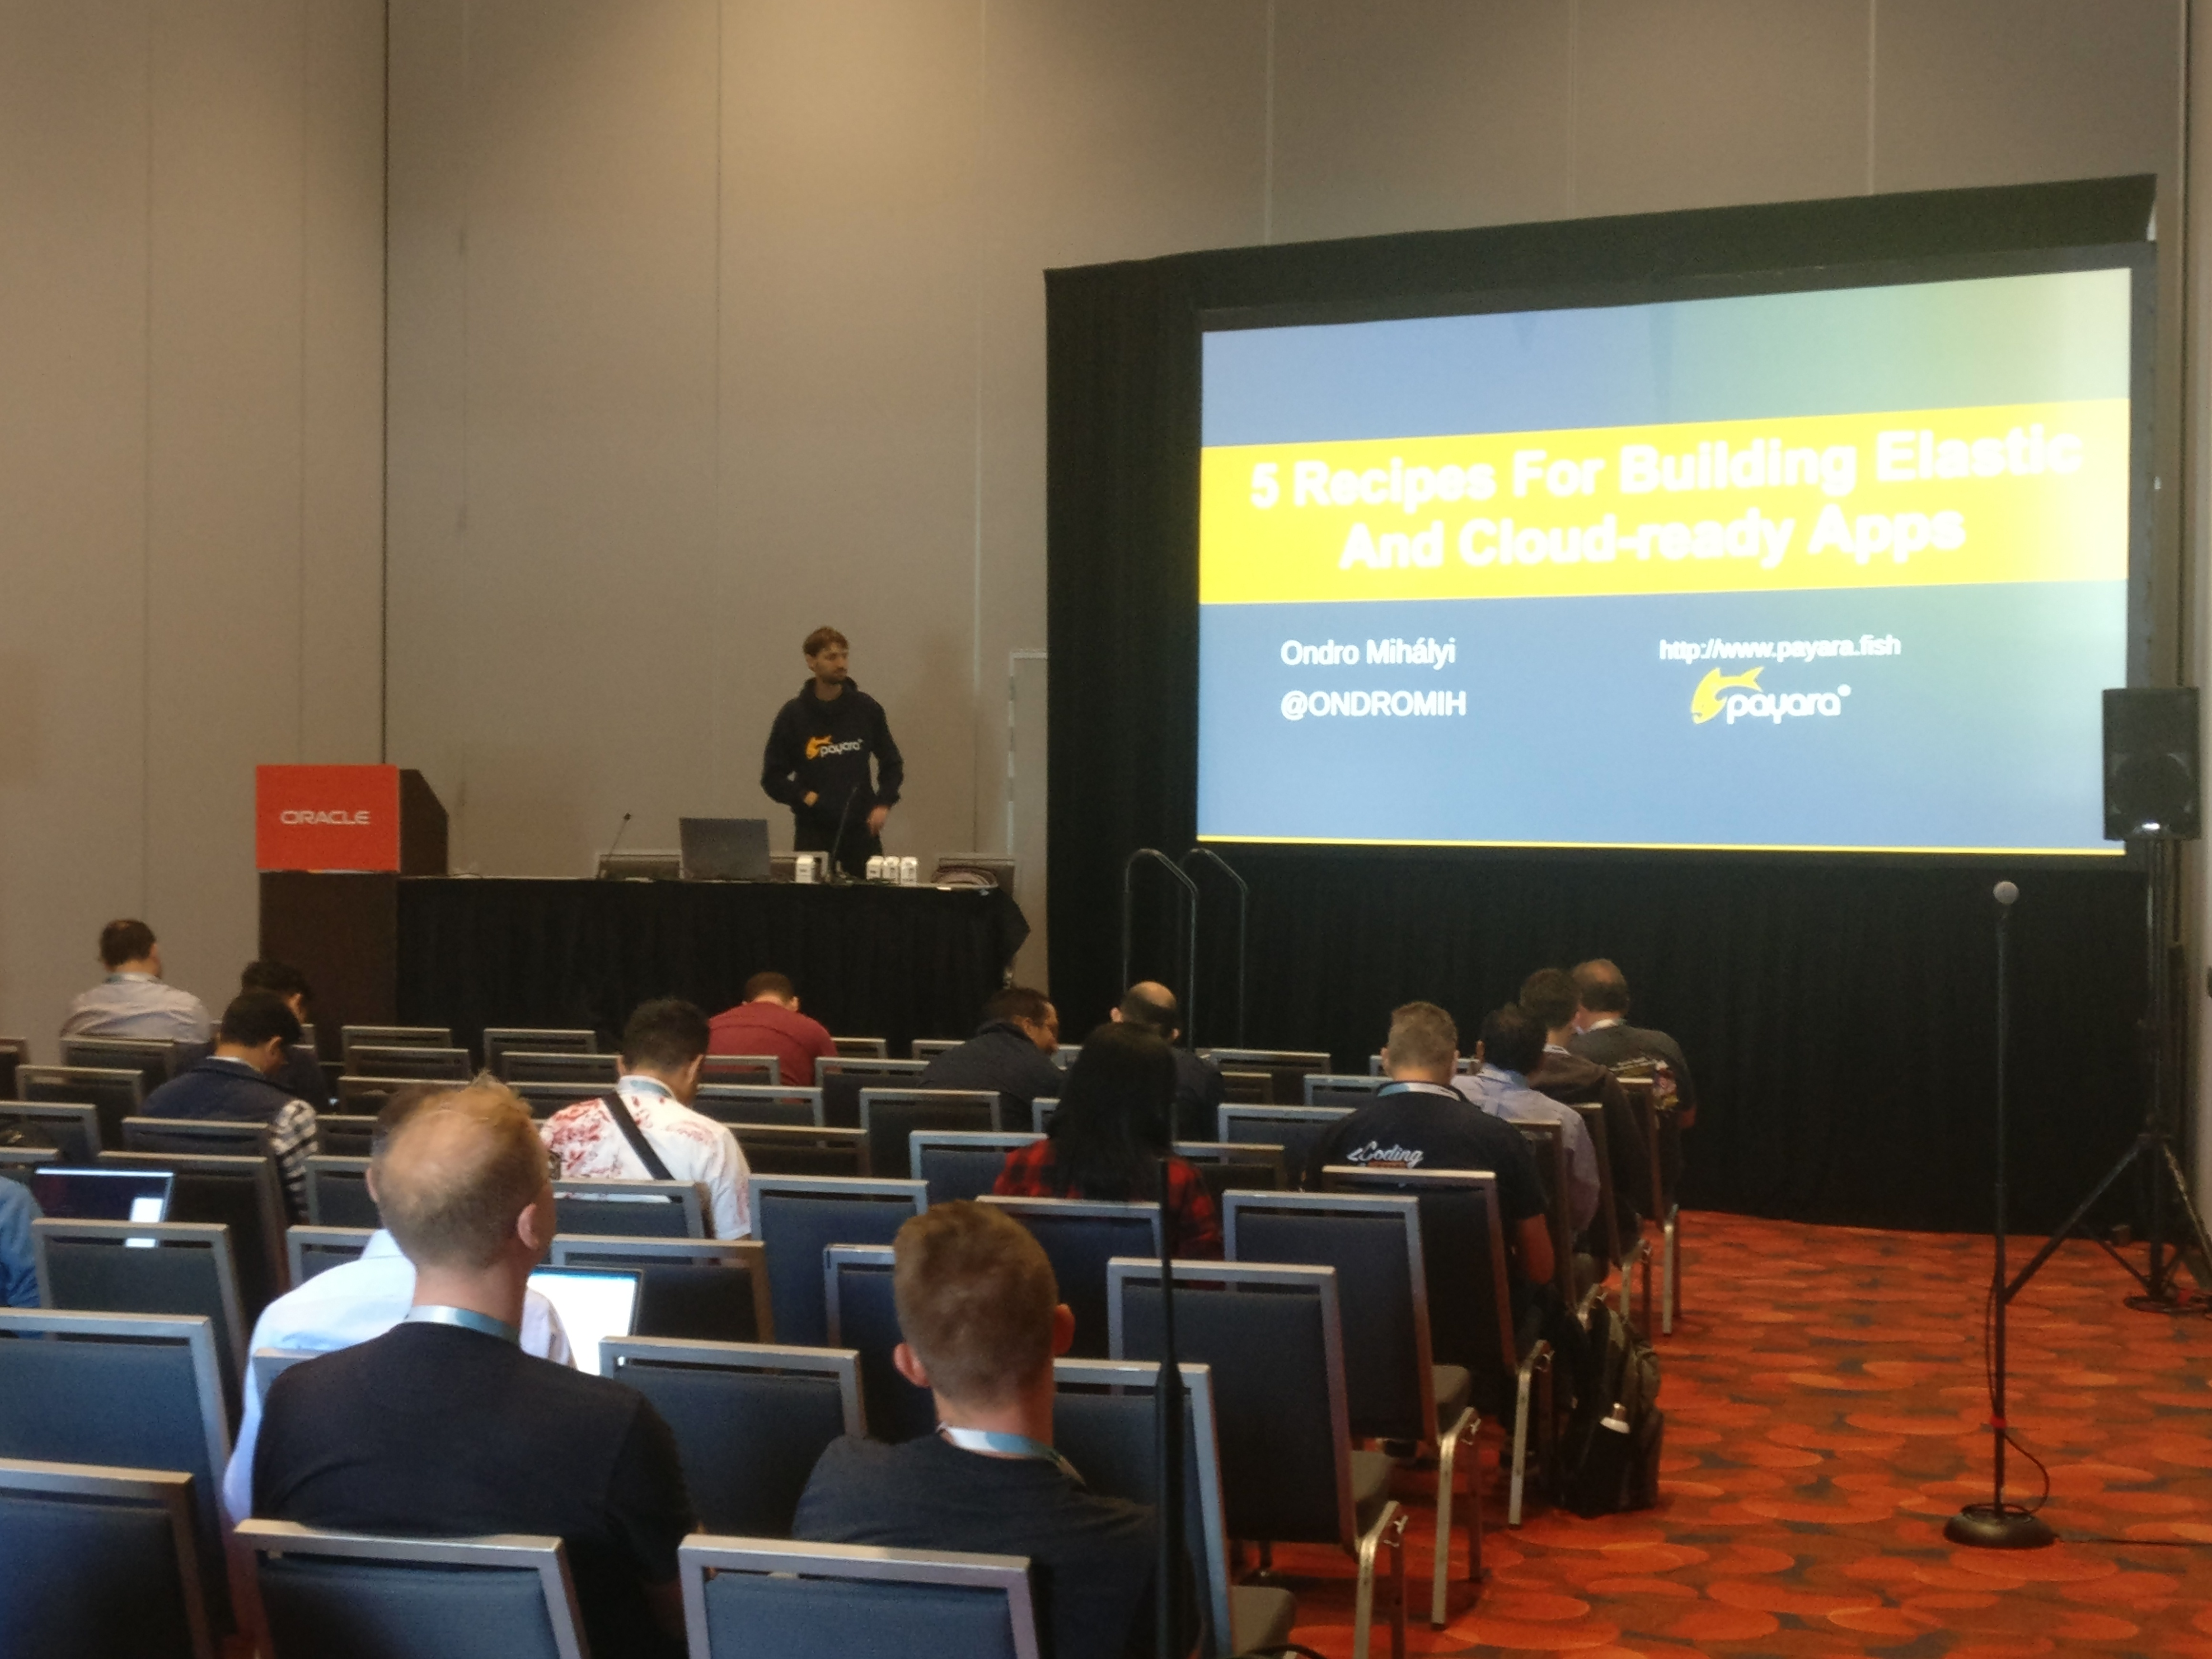 Ondrej presenting at Oracle Code One